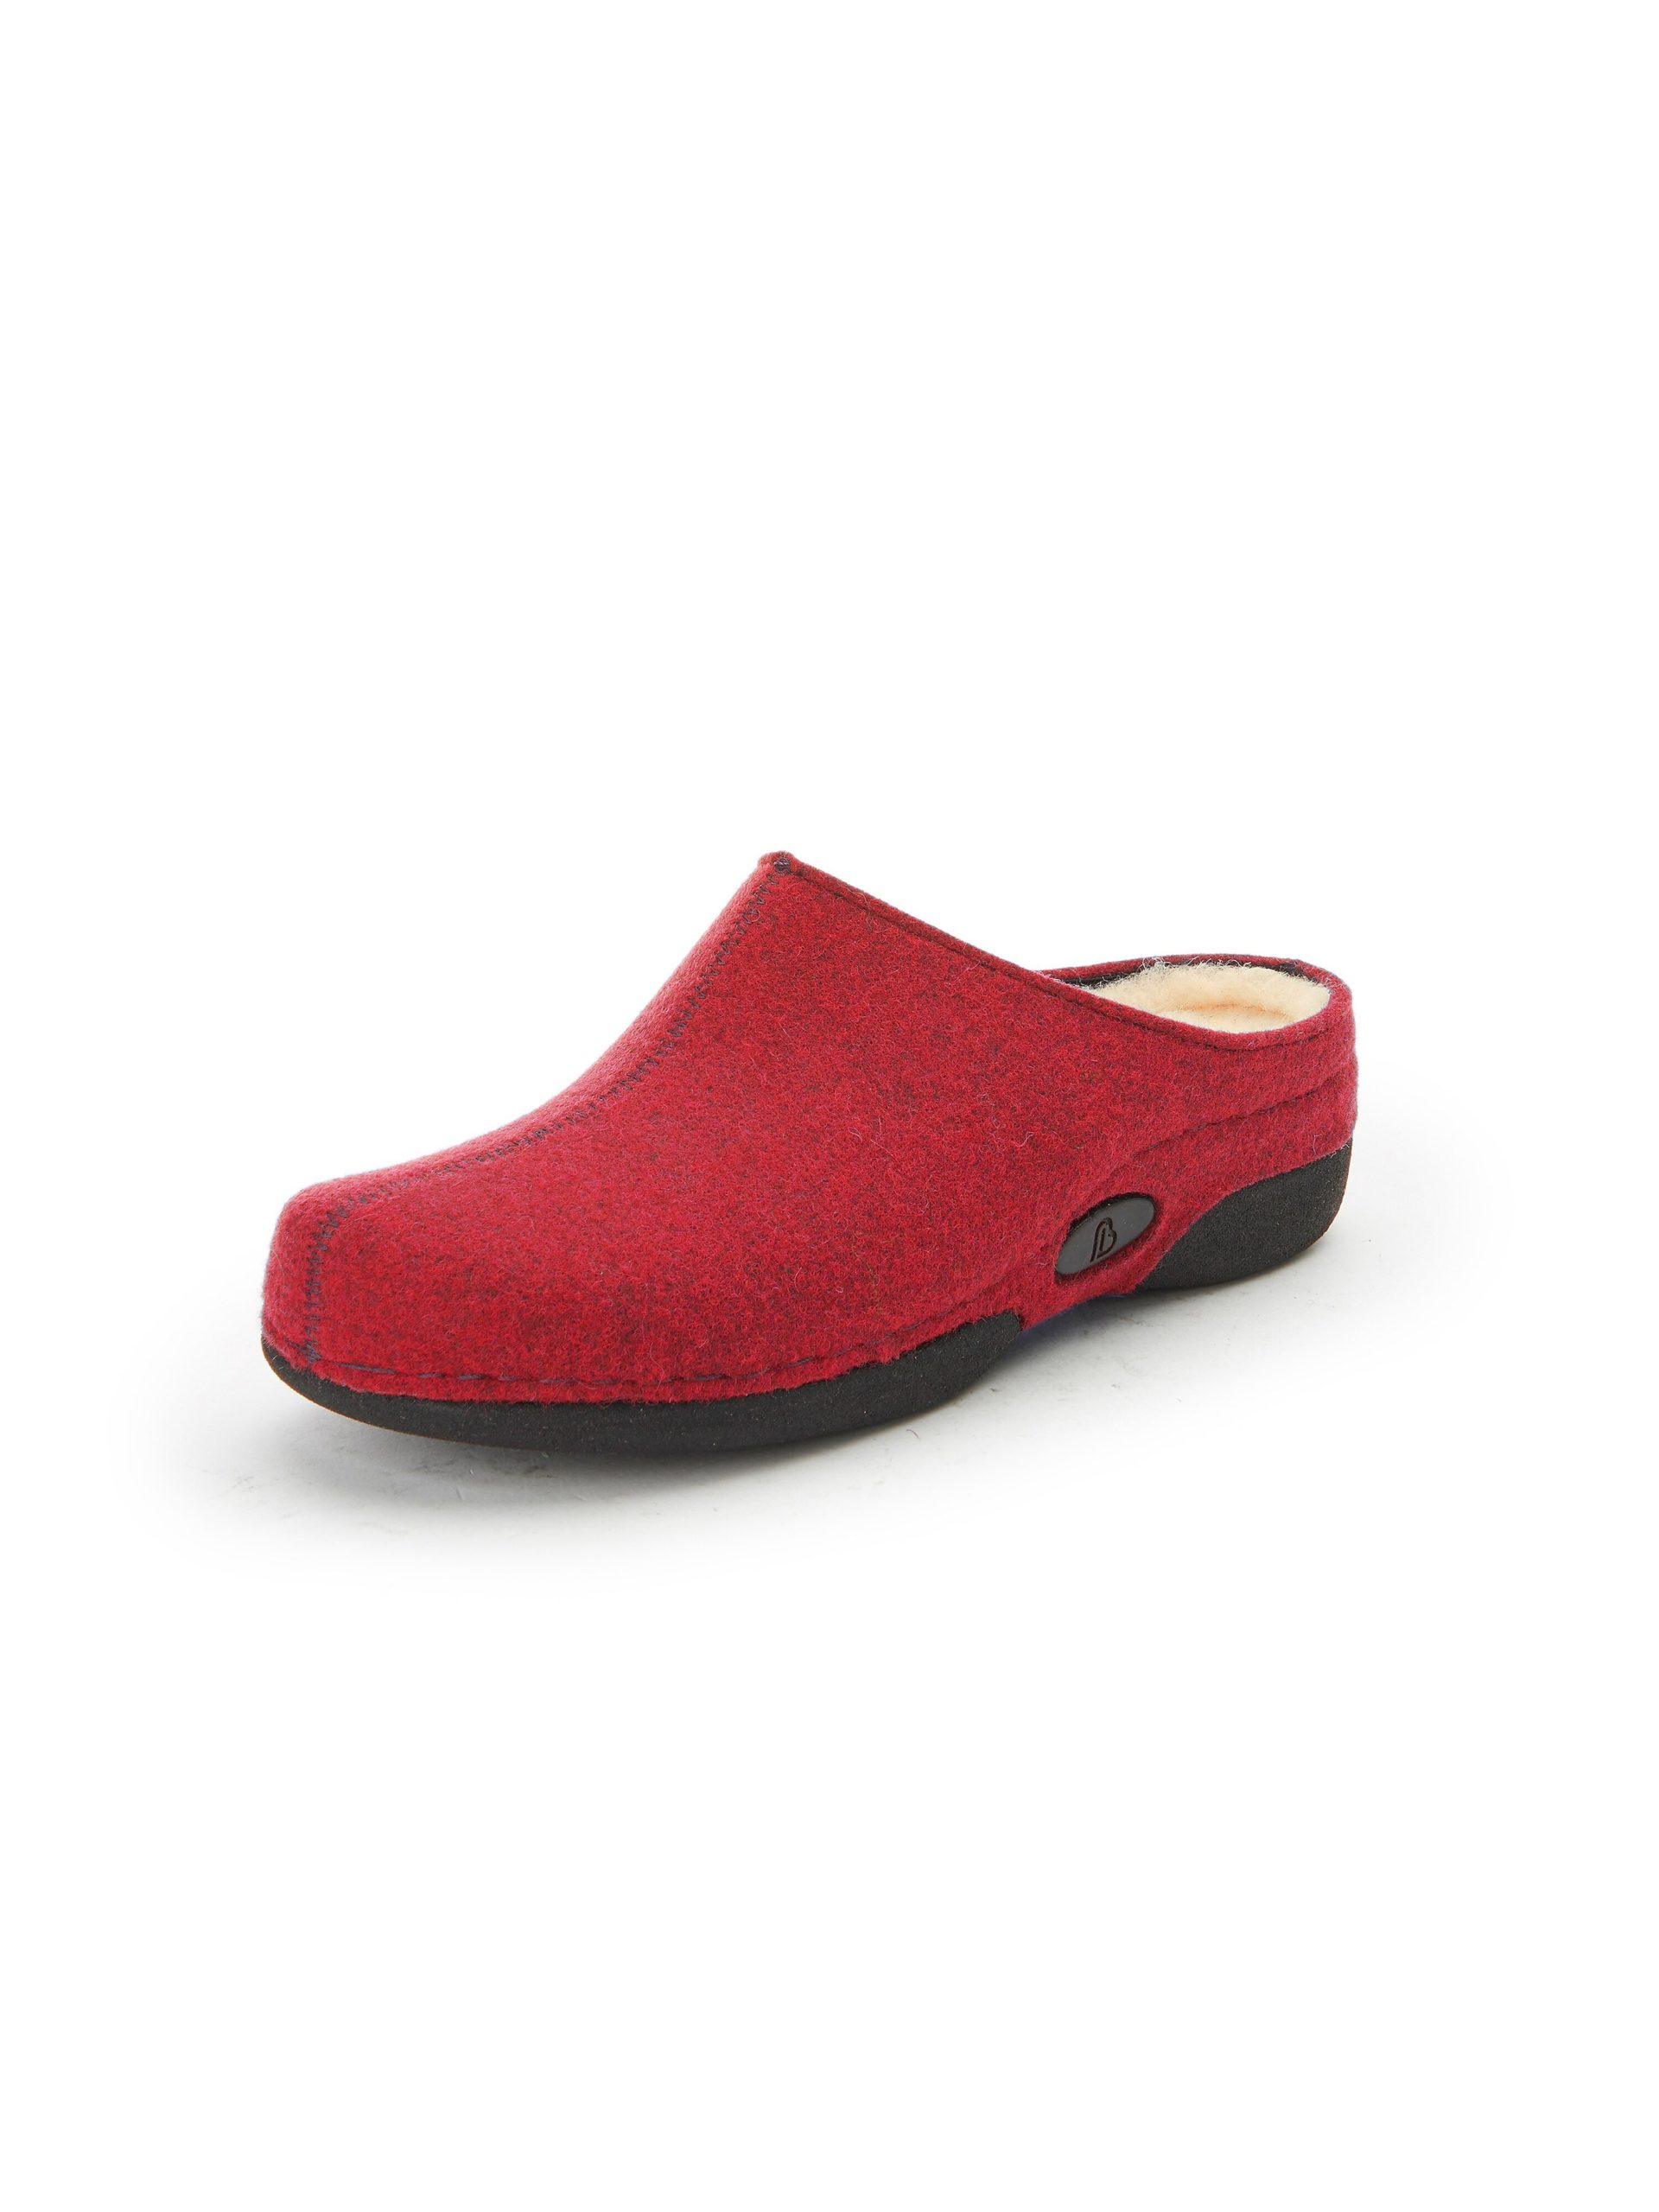 Pantoffels Van Berkemann Original rood Kopen